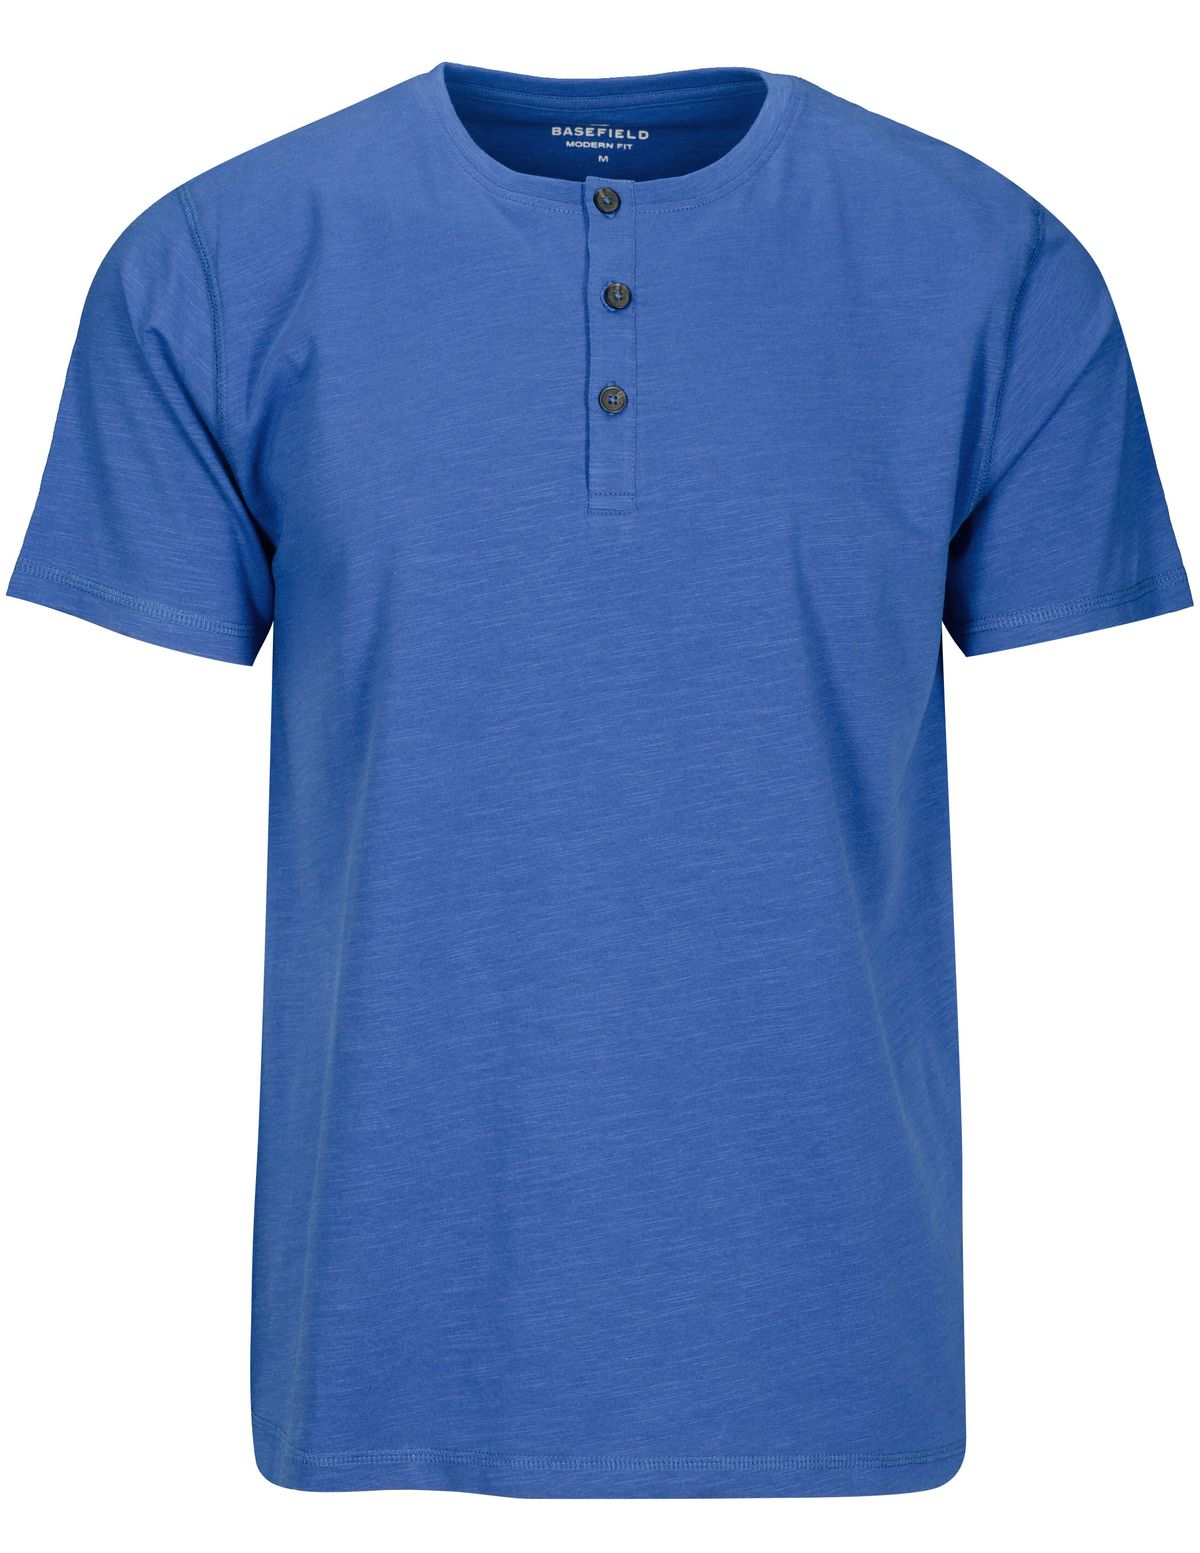 Henley Shirt - Royal